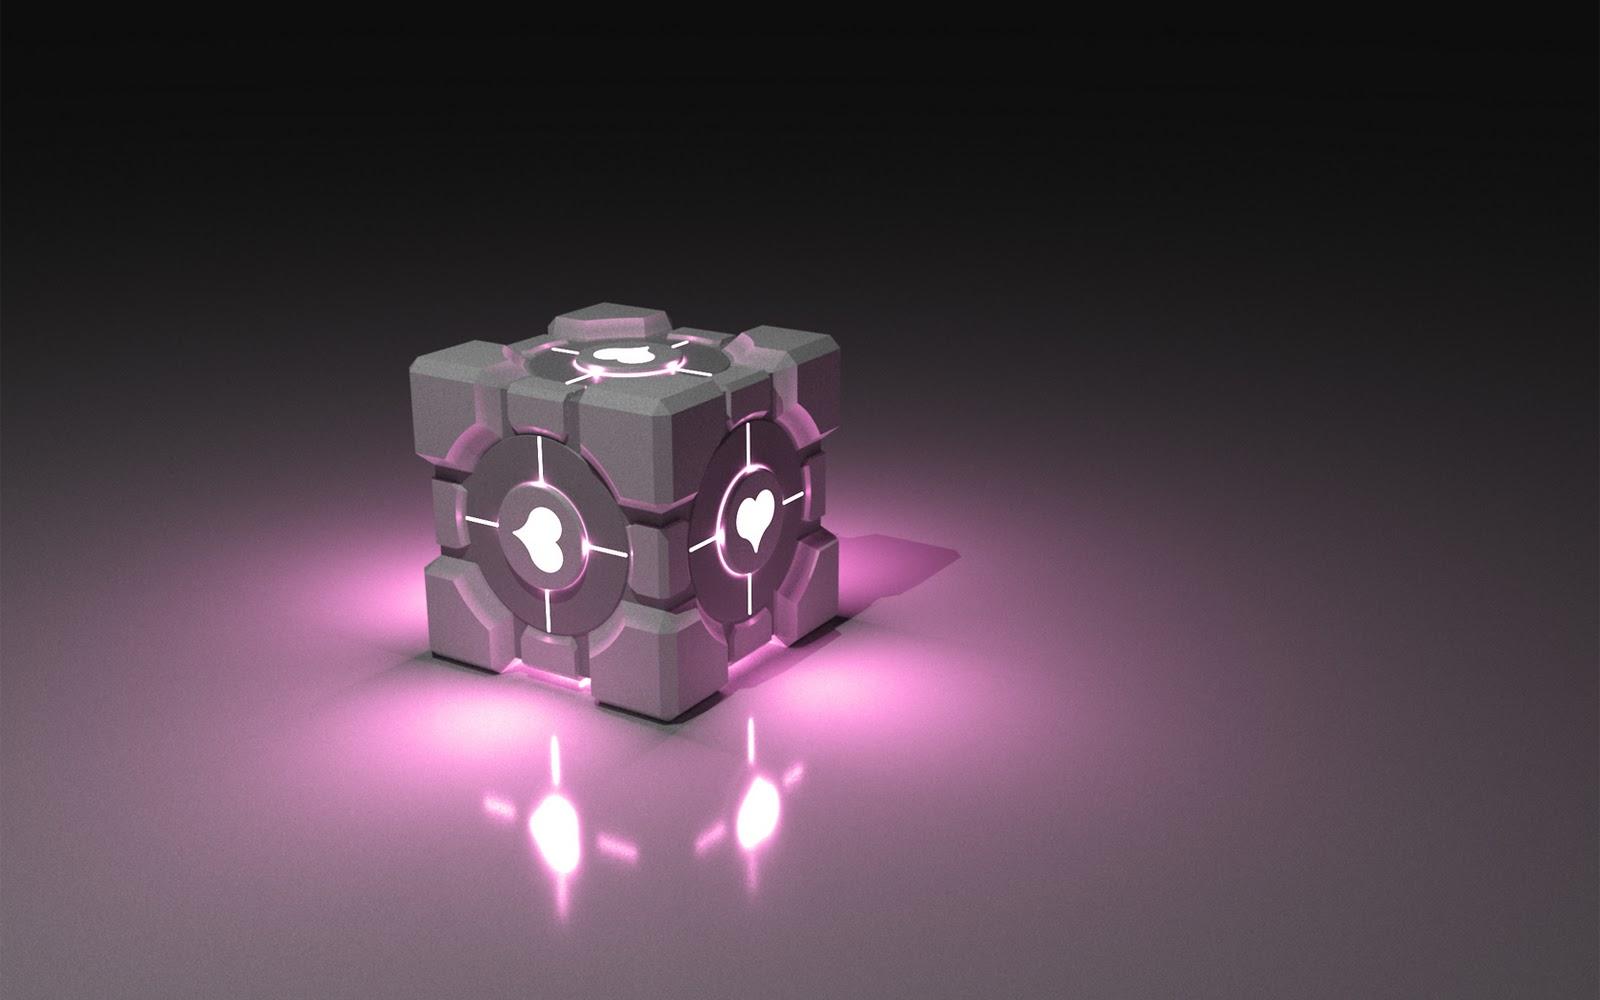 Will It Blender 3d Wallpaper Companion Cube